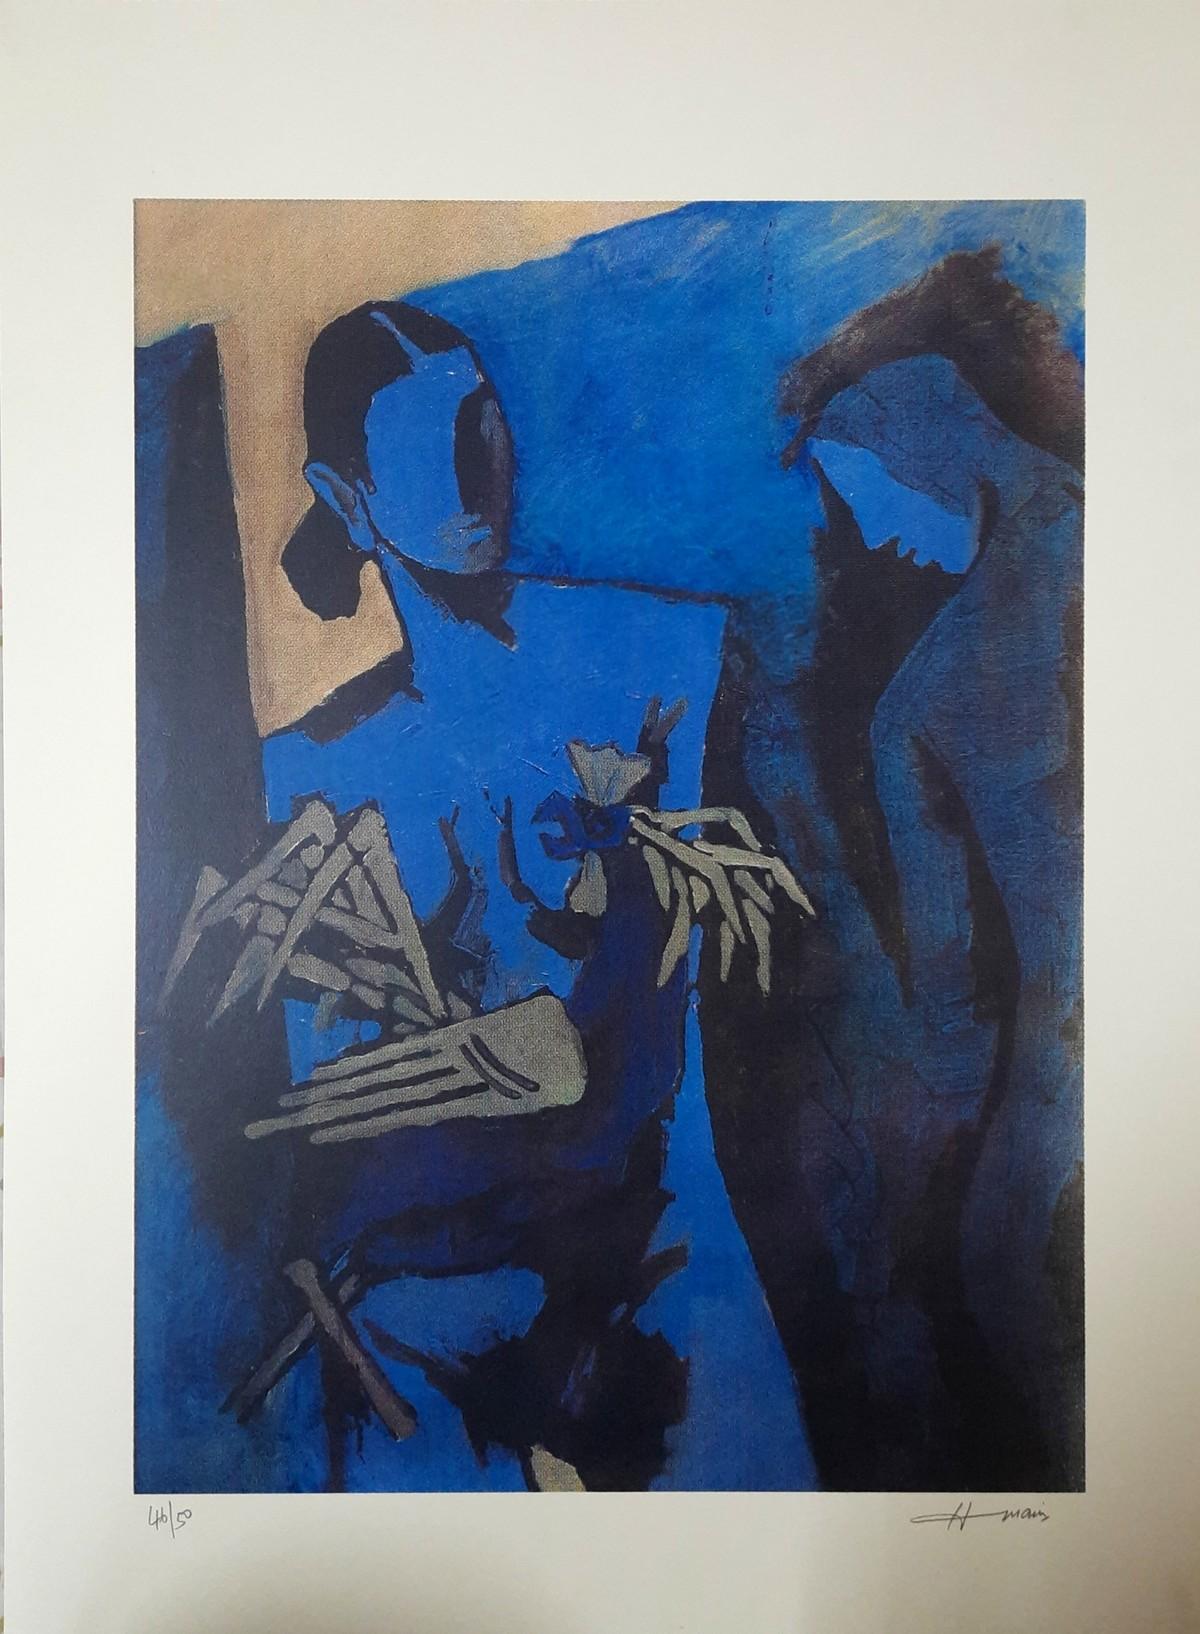 Paris suite by M F Husain, Expressionism Serigraph, Serigraph on Paper, Oxford Blue color